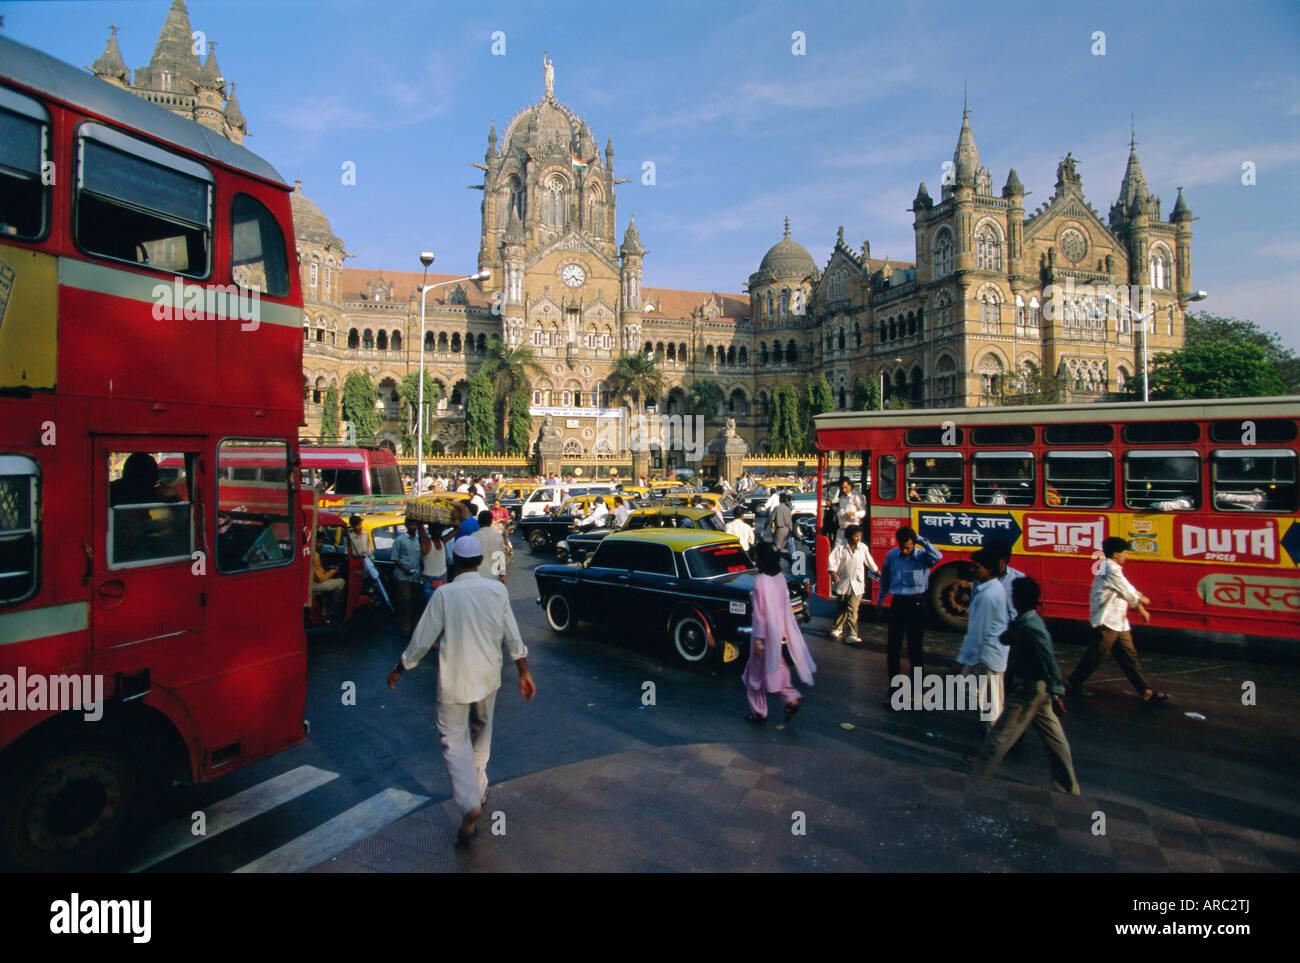 Traffic in front of the station, Victoria Railway Terminus, Mumbai (Bombay), Maharashtra State, India - Stock Image